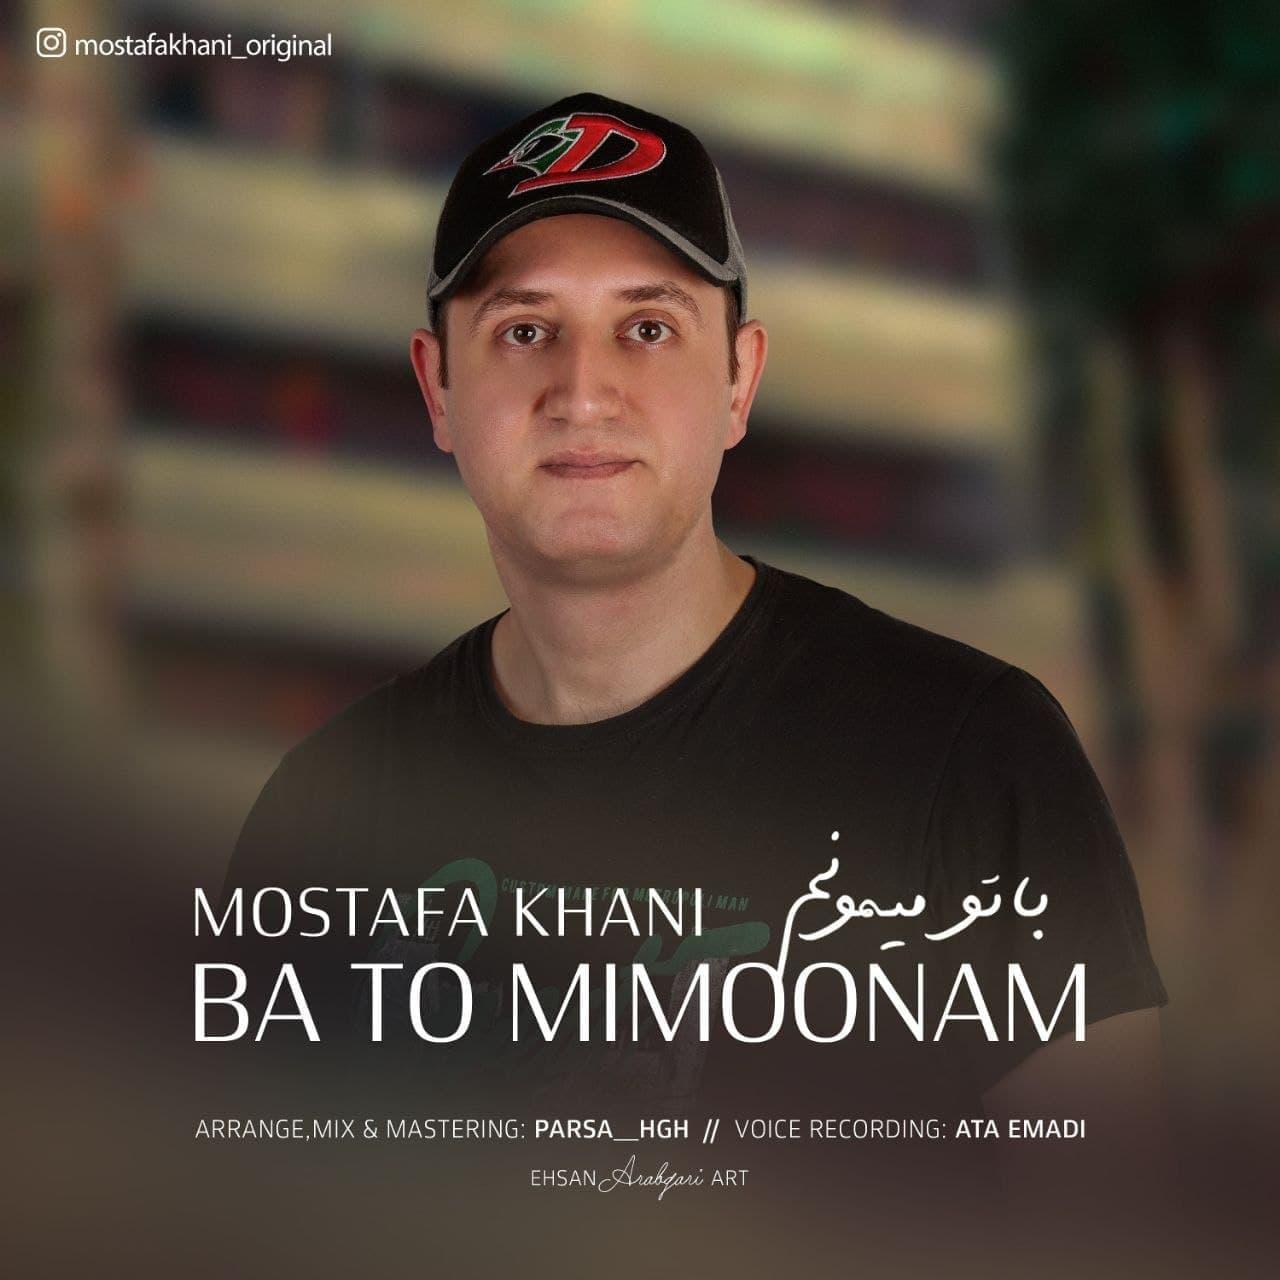 Download Ahang مصطفی خانی با تو میمونم